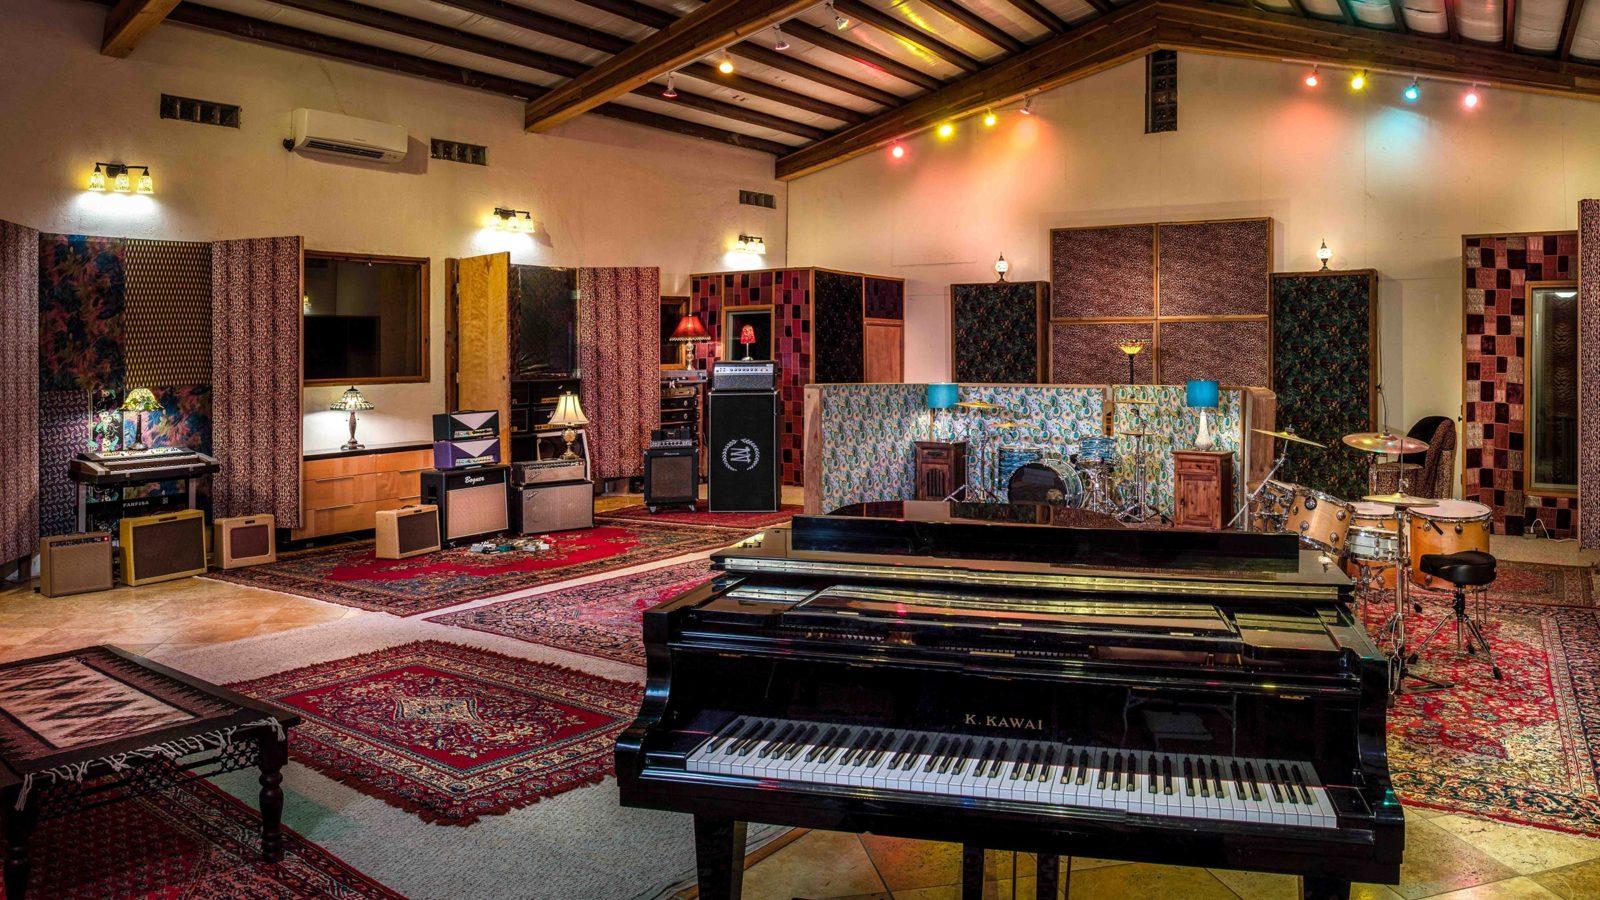 Studio Neve - Tracking Room grand piano